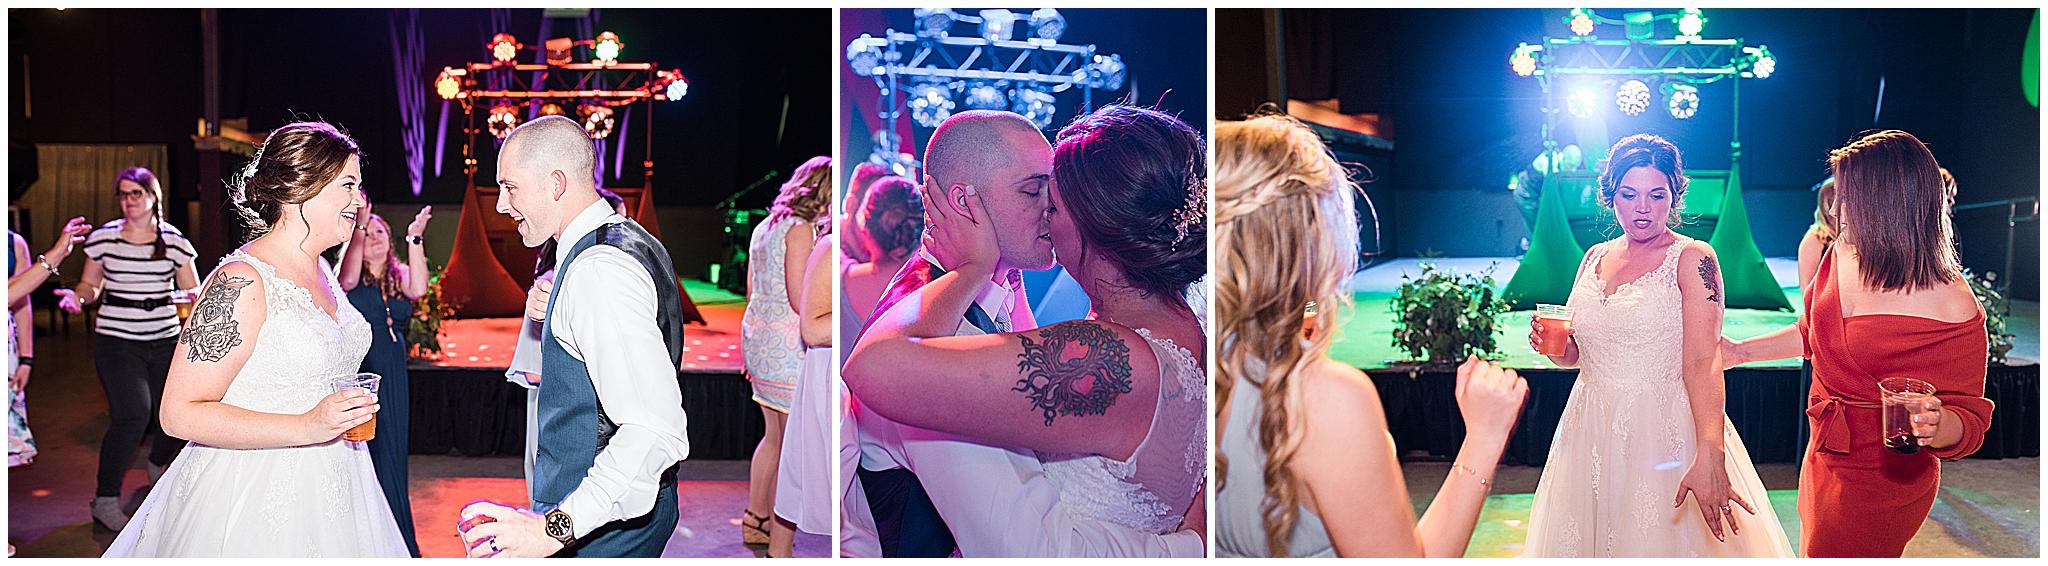 Wedding_Photographer_Asheville_Highland_Brewing_0022.jpg